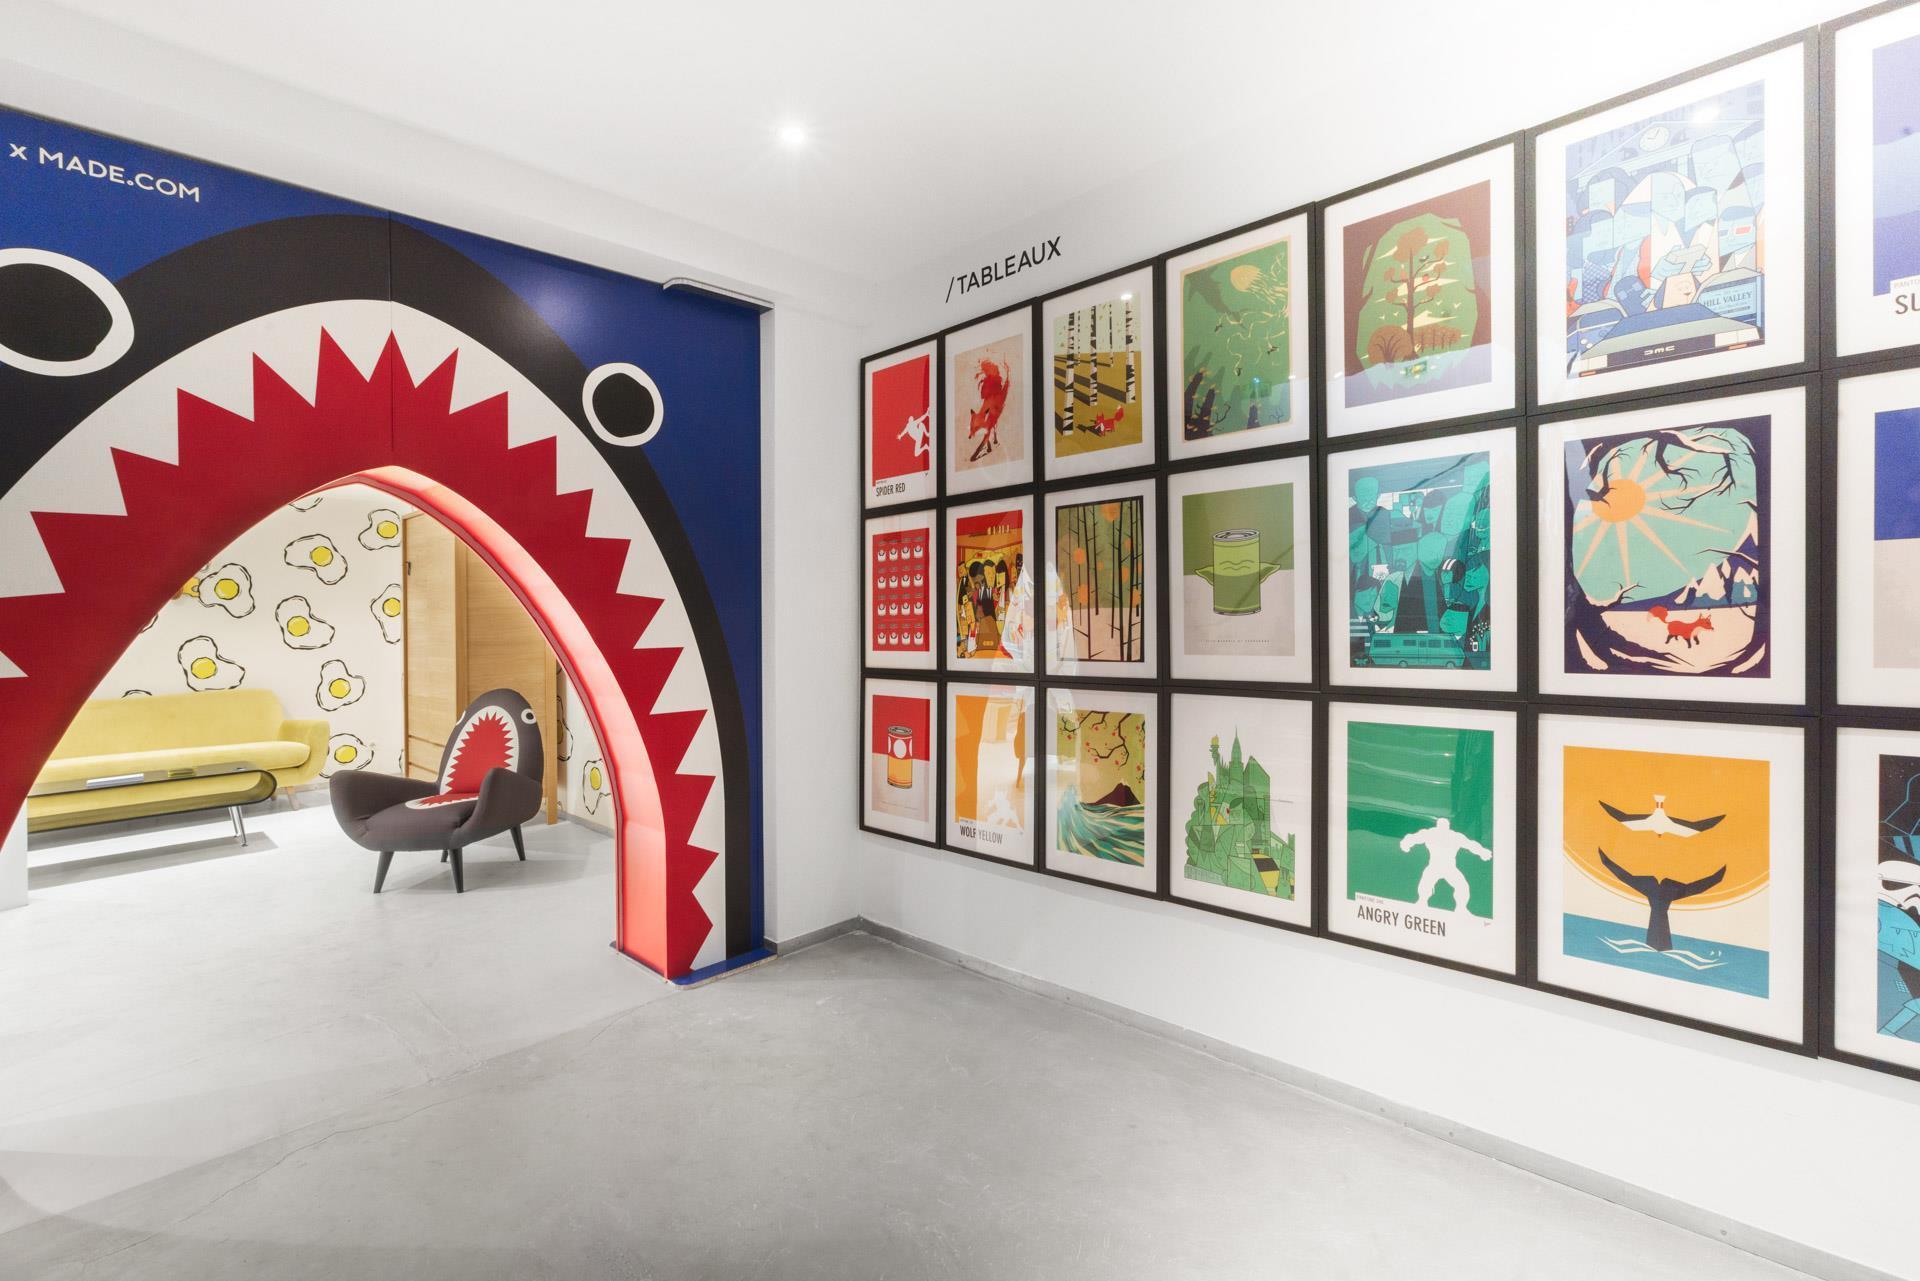 store of the week uses digital storytelling in new paris studio photo gallery. Black Bedroom Furniture Sets. Home Design Ideas